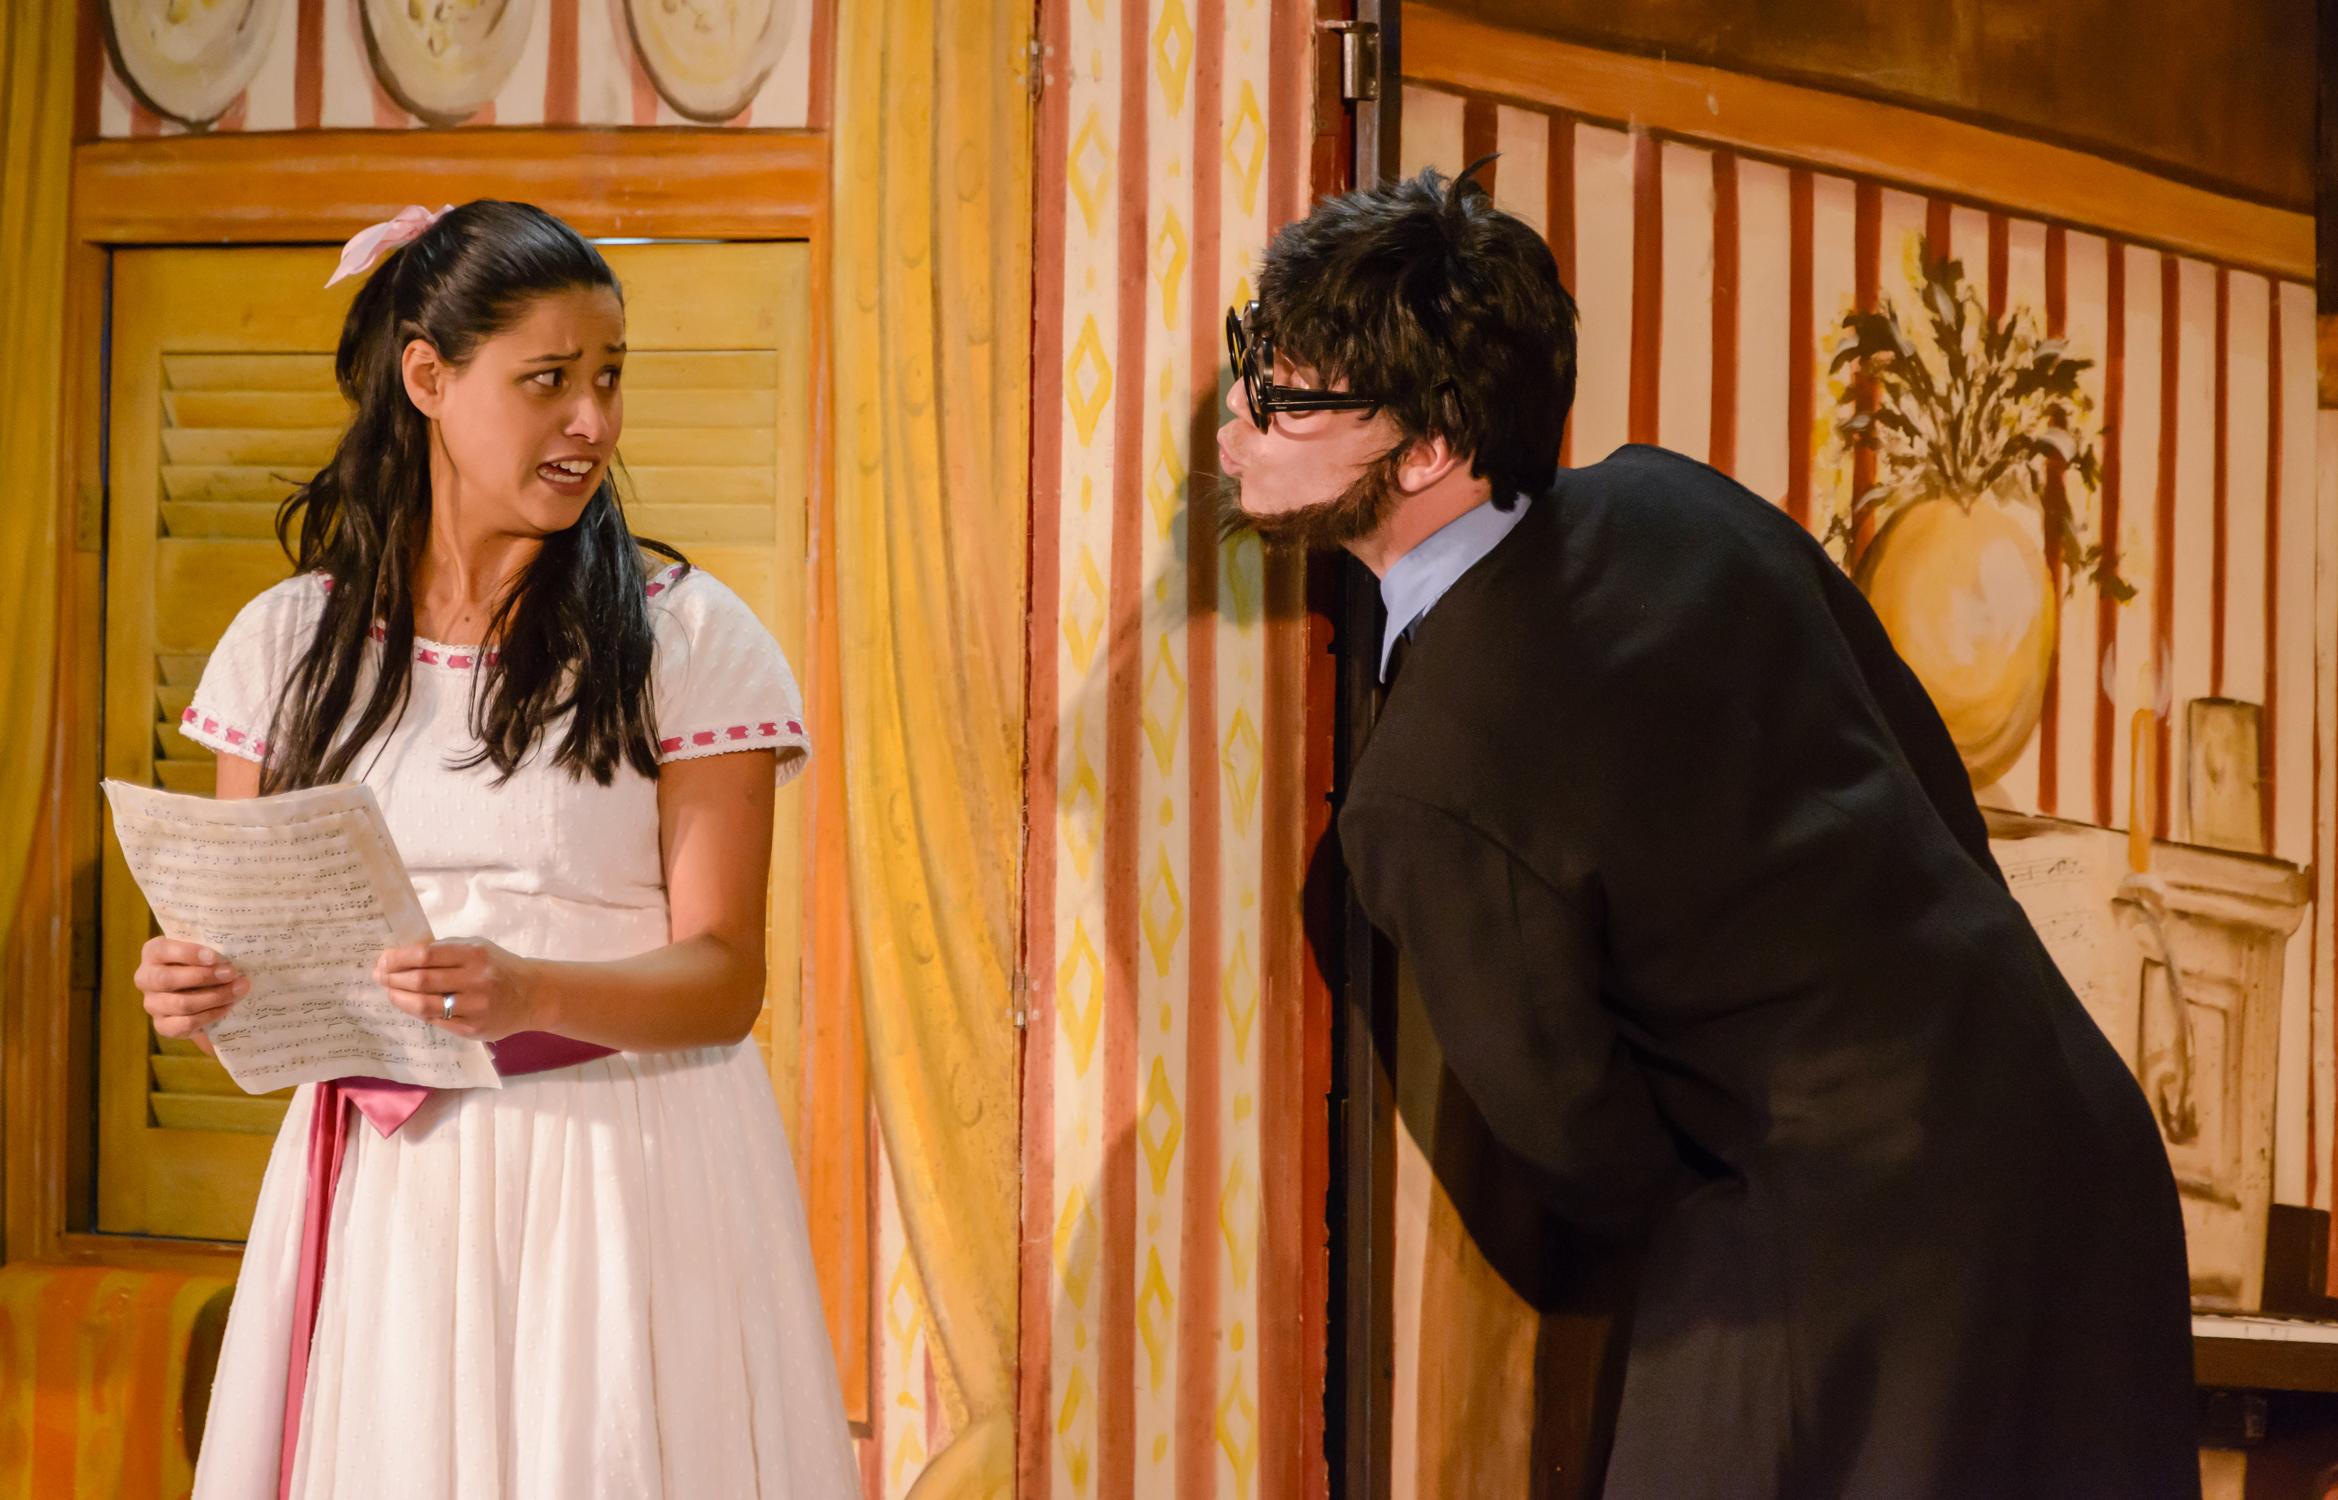 Stacey Alleaume as Rosina, Nicholas Jones as Count Almaviva. Photo:©Albert Comper